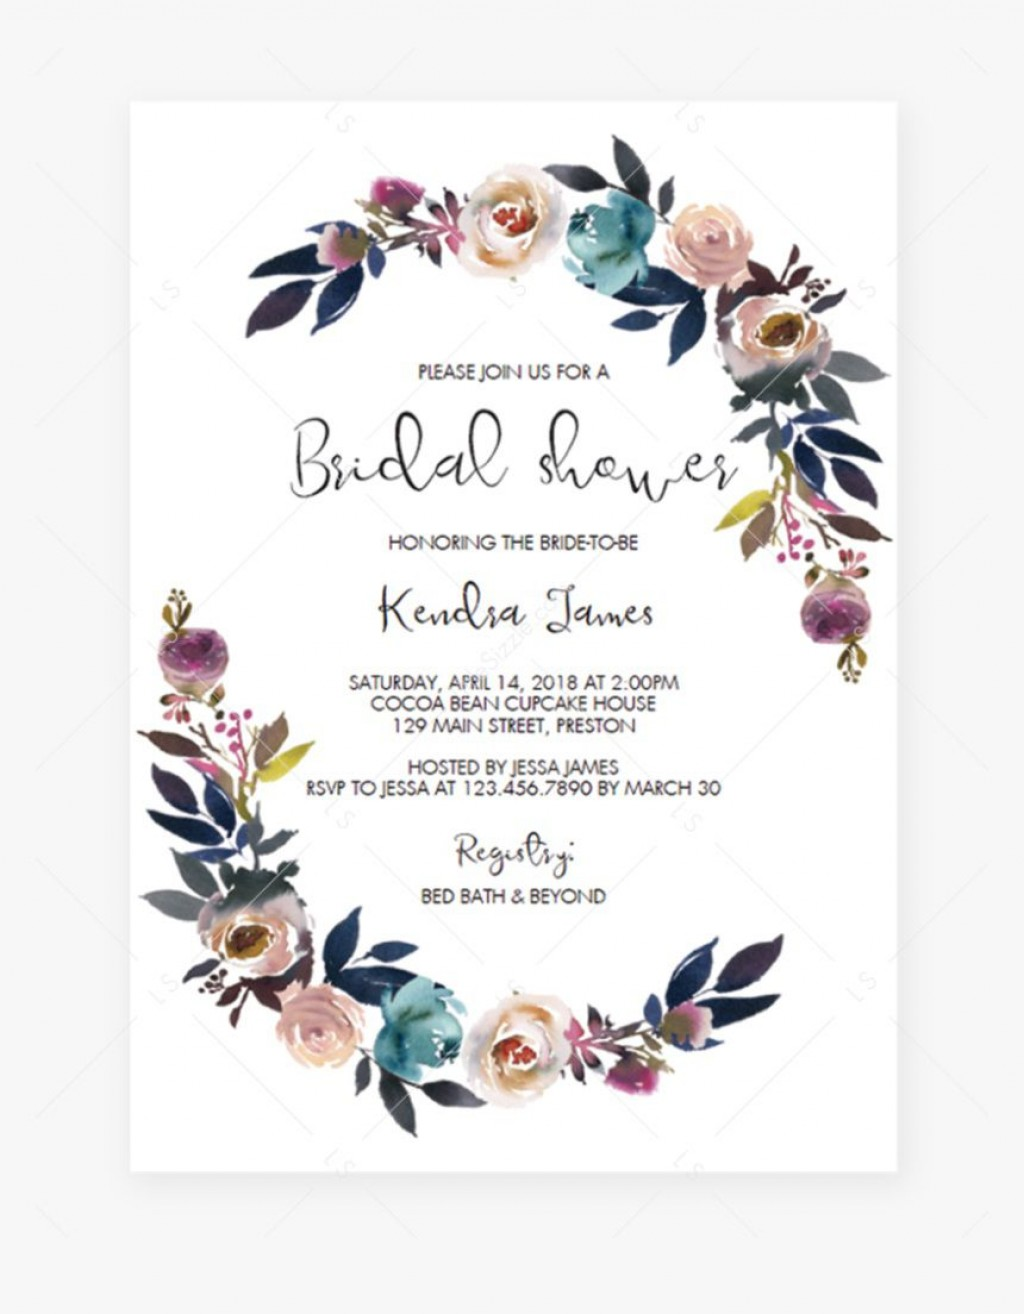 000 Unbelievable Baby Shower Invitation Free Template Image  Templates Online Printable E-invitation Card Design DownloadLarge